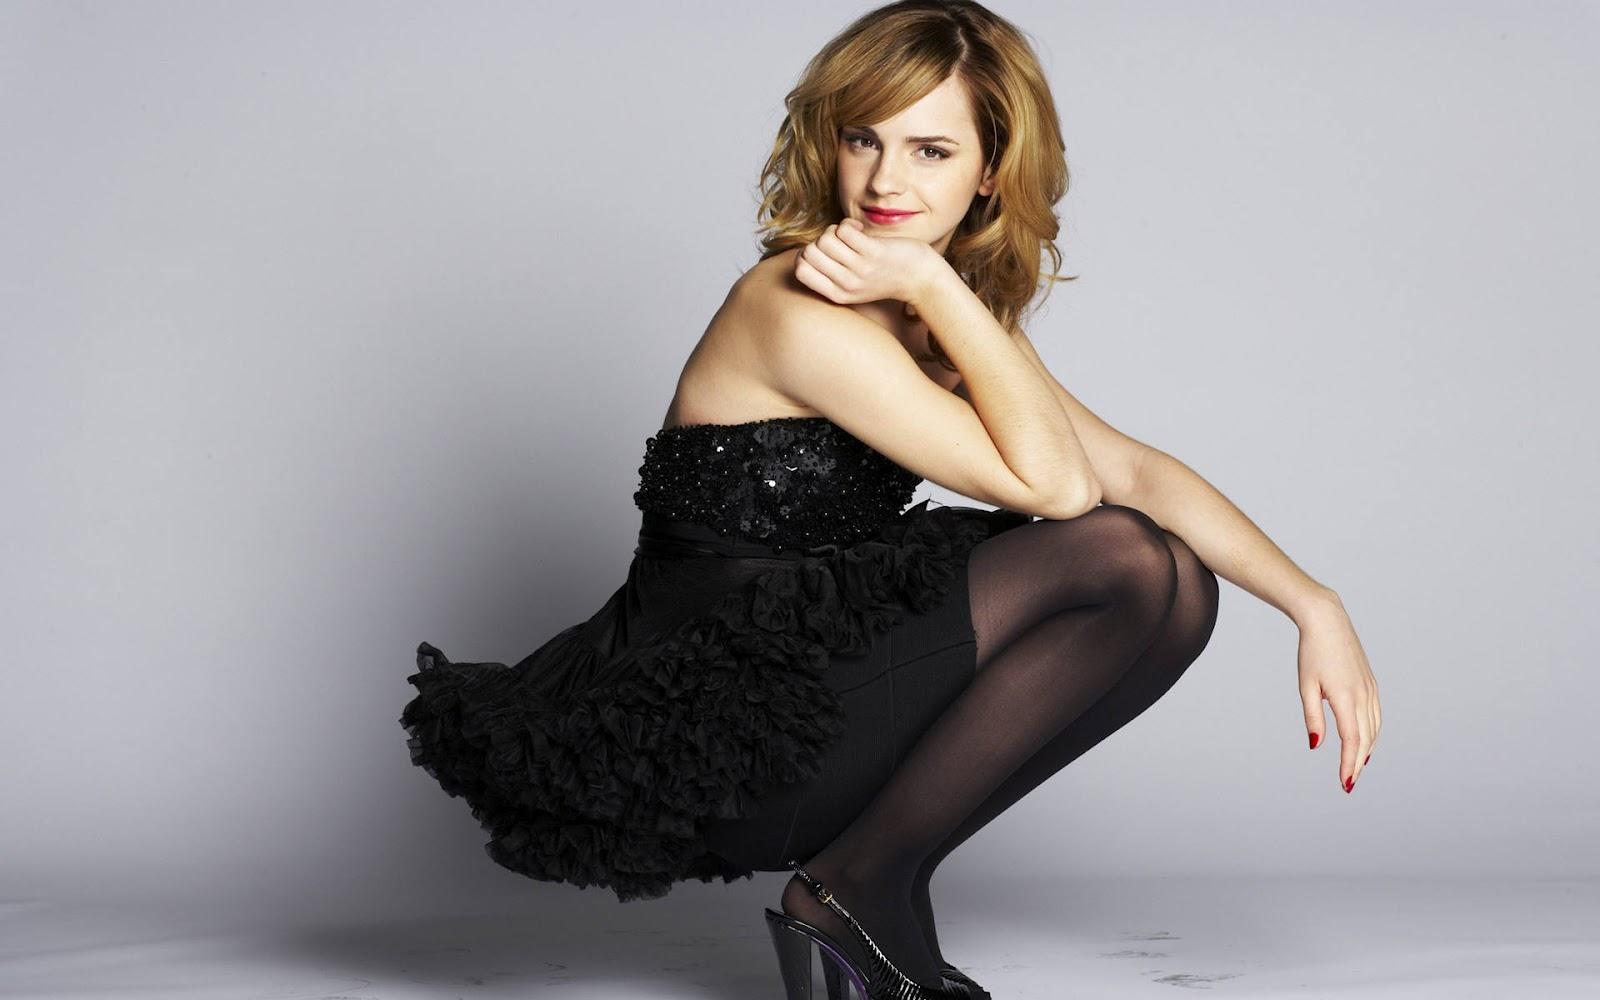 Wallpaper a day: emma watson in a black skirt and tights ... эмма уотсон инстаграм